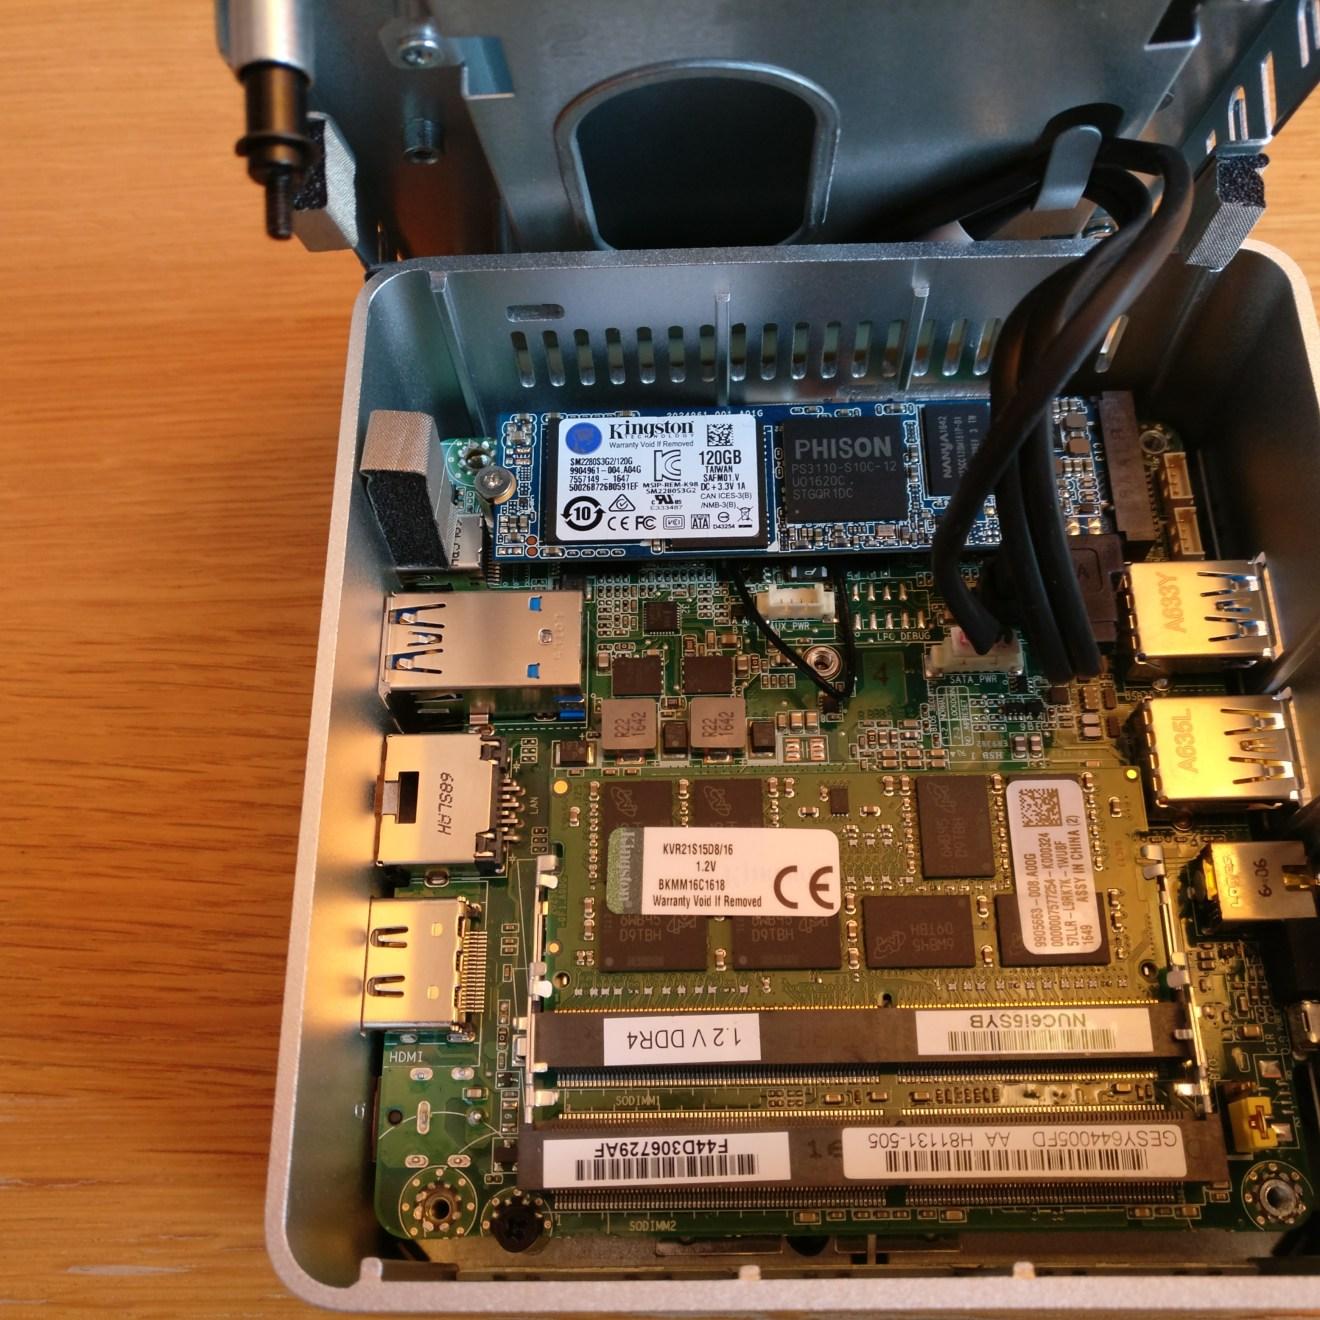 domalab.com intel nuc home lab Intel NUC ram